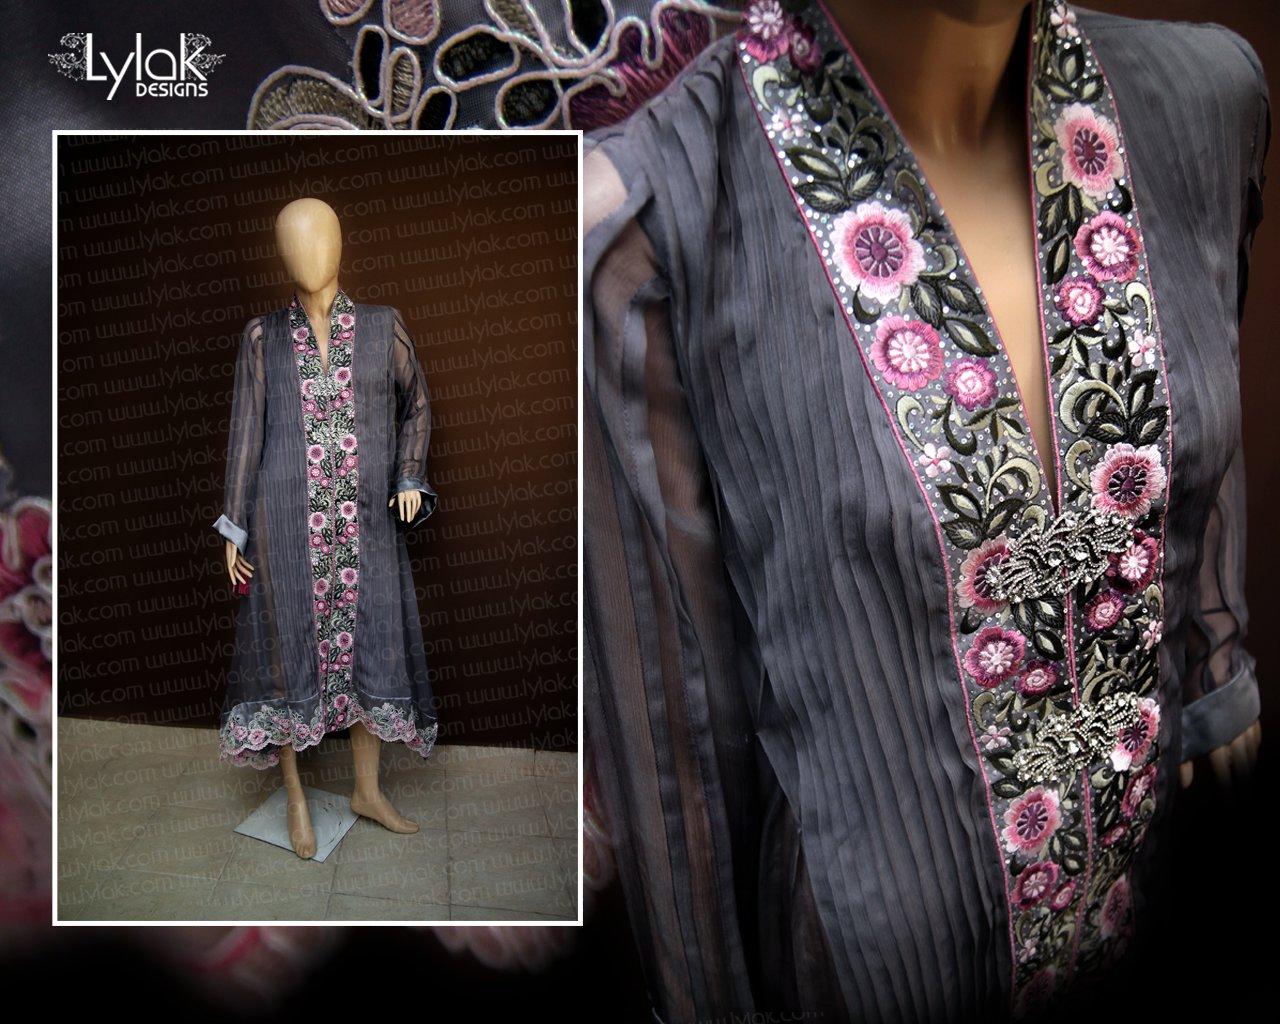 Gray Formal Dress by Lylak Designs 011